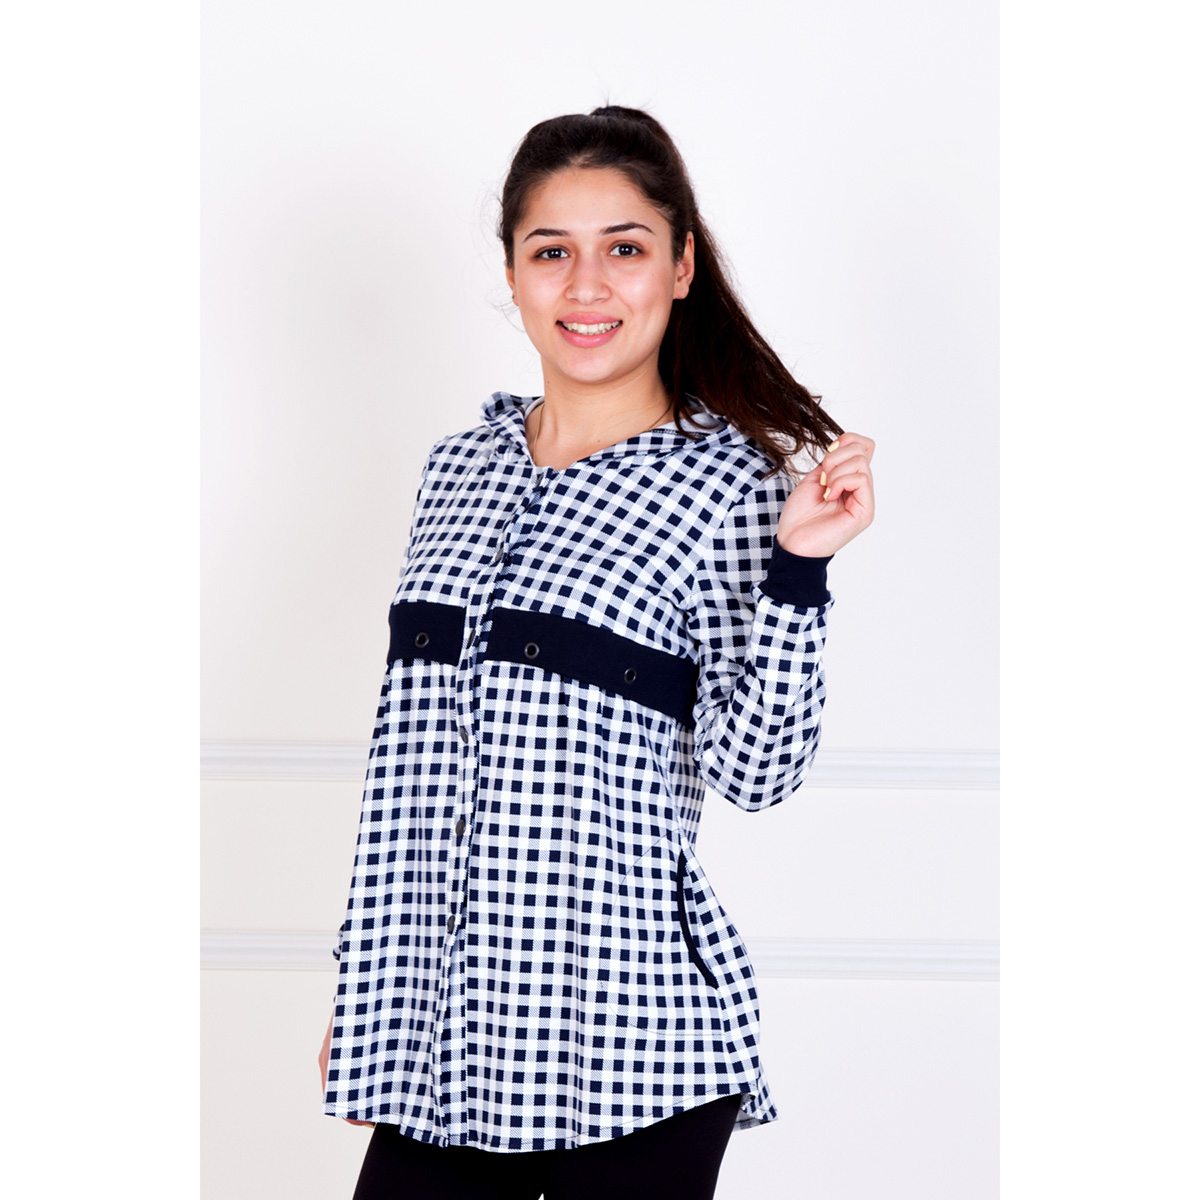 Жен. рубашка Фортуна р. 48Блузки, майки, кофты<br>Обхват груди:96 см<br>Обхват талии:78 см<br>Обхват бедер:104 см<br>Длина по спинке:69 см<br>Рост:167 см<br><br>Тип: Жен. рубашка<br>Размер: 48<br>Материал: Интерлок